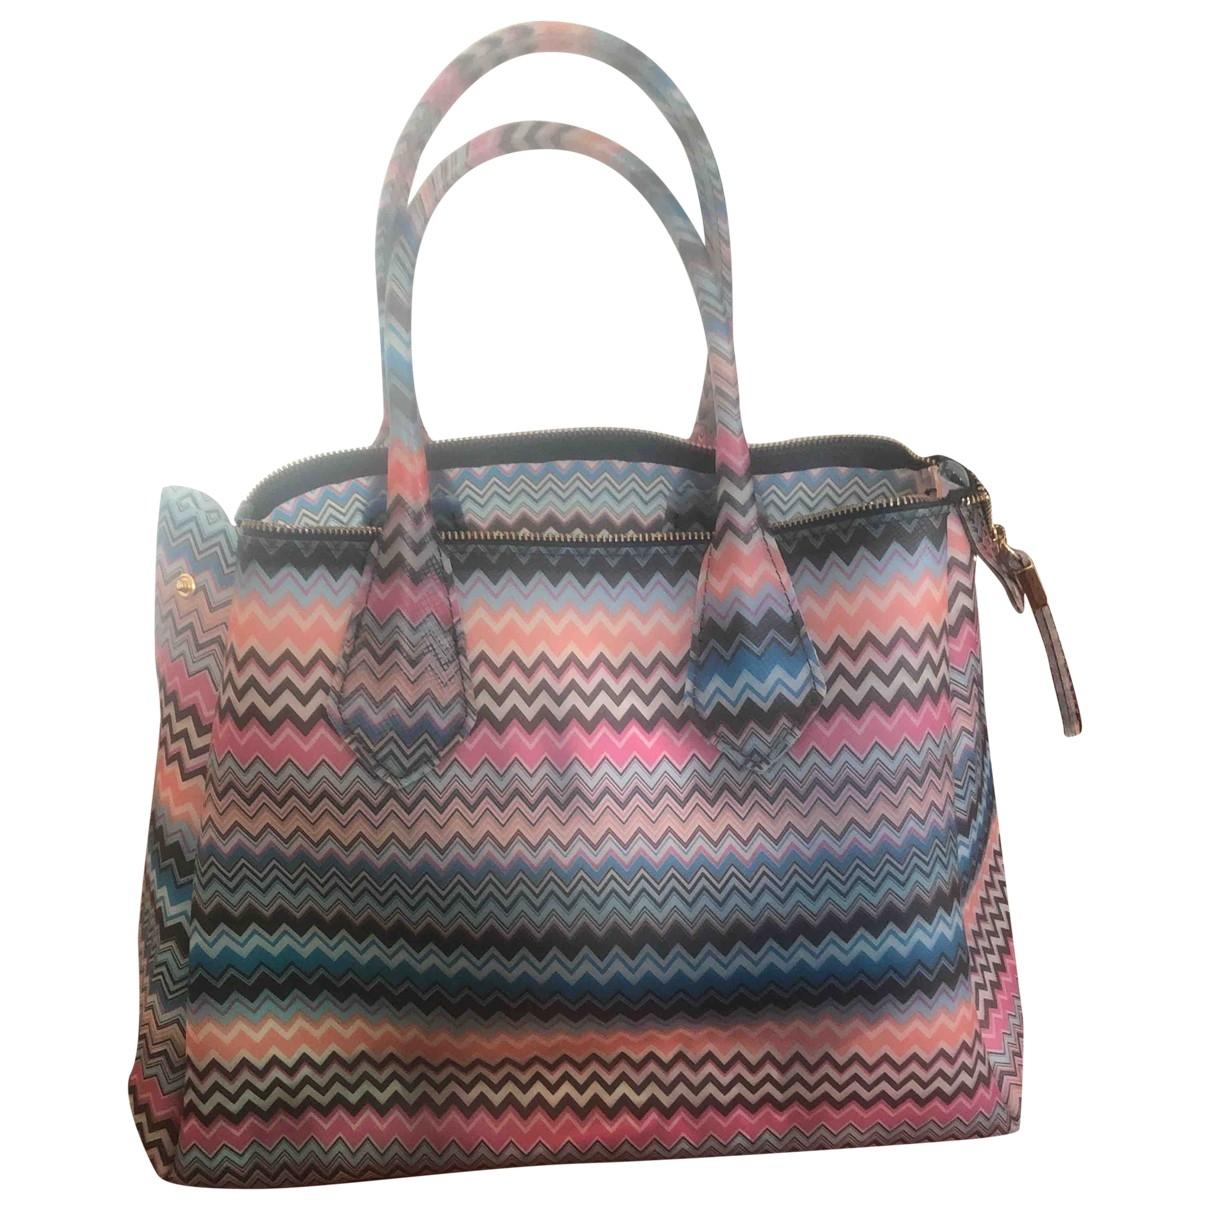 Gianni Chiarini \N Multicolour handbag for Women \N